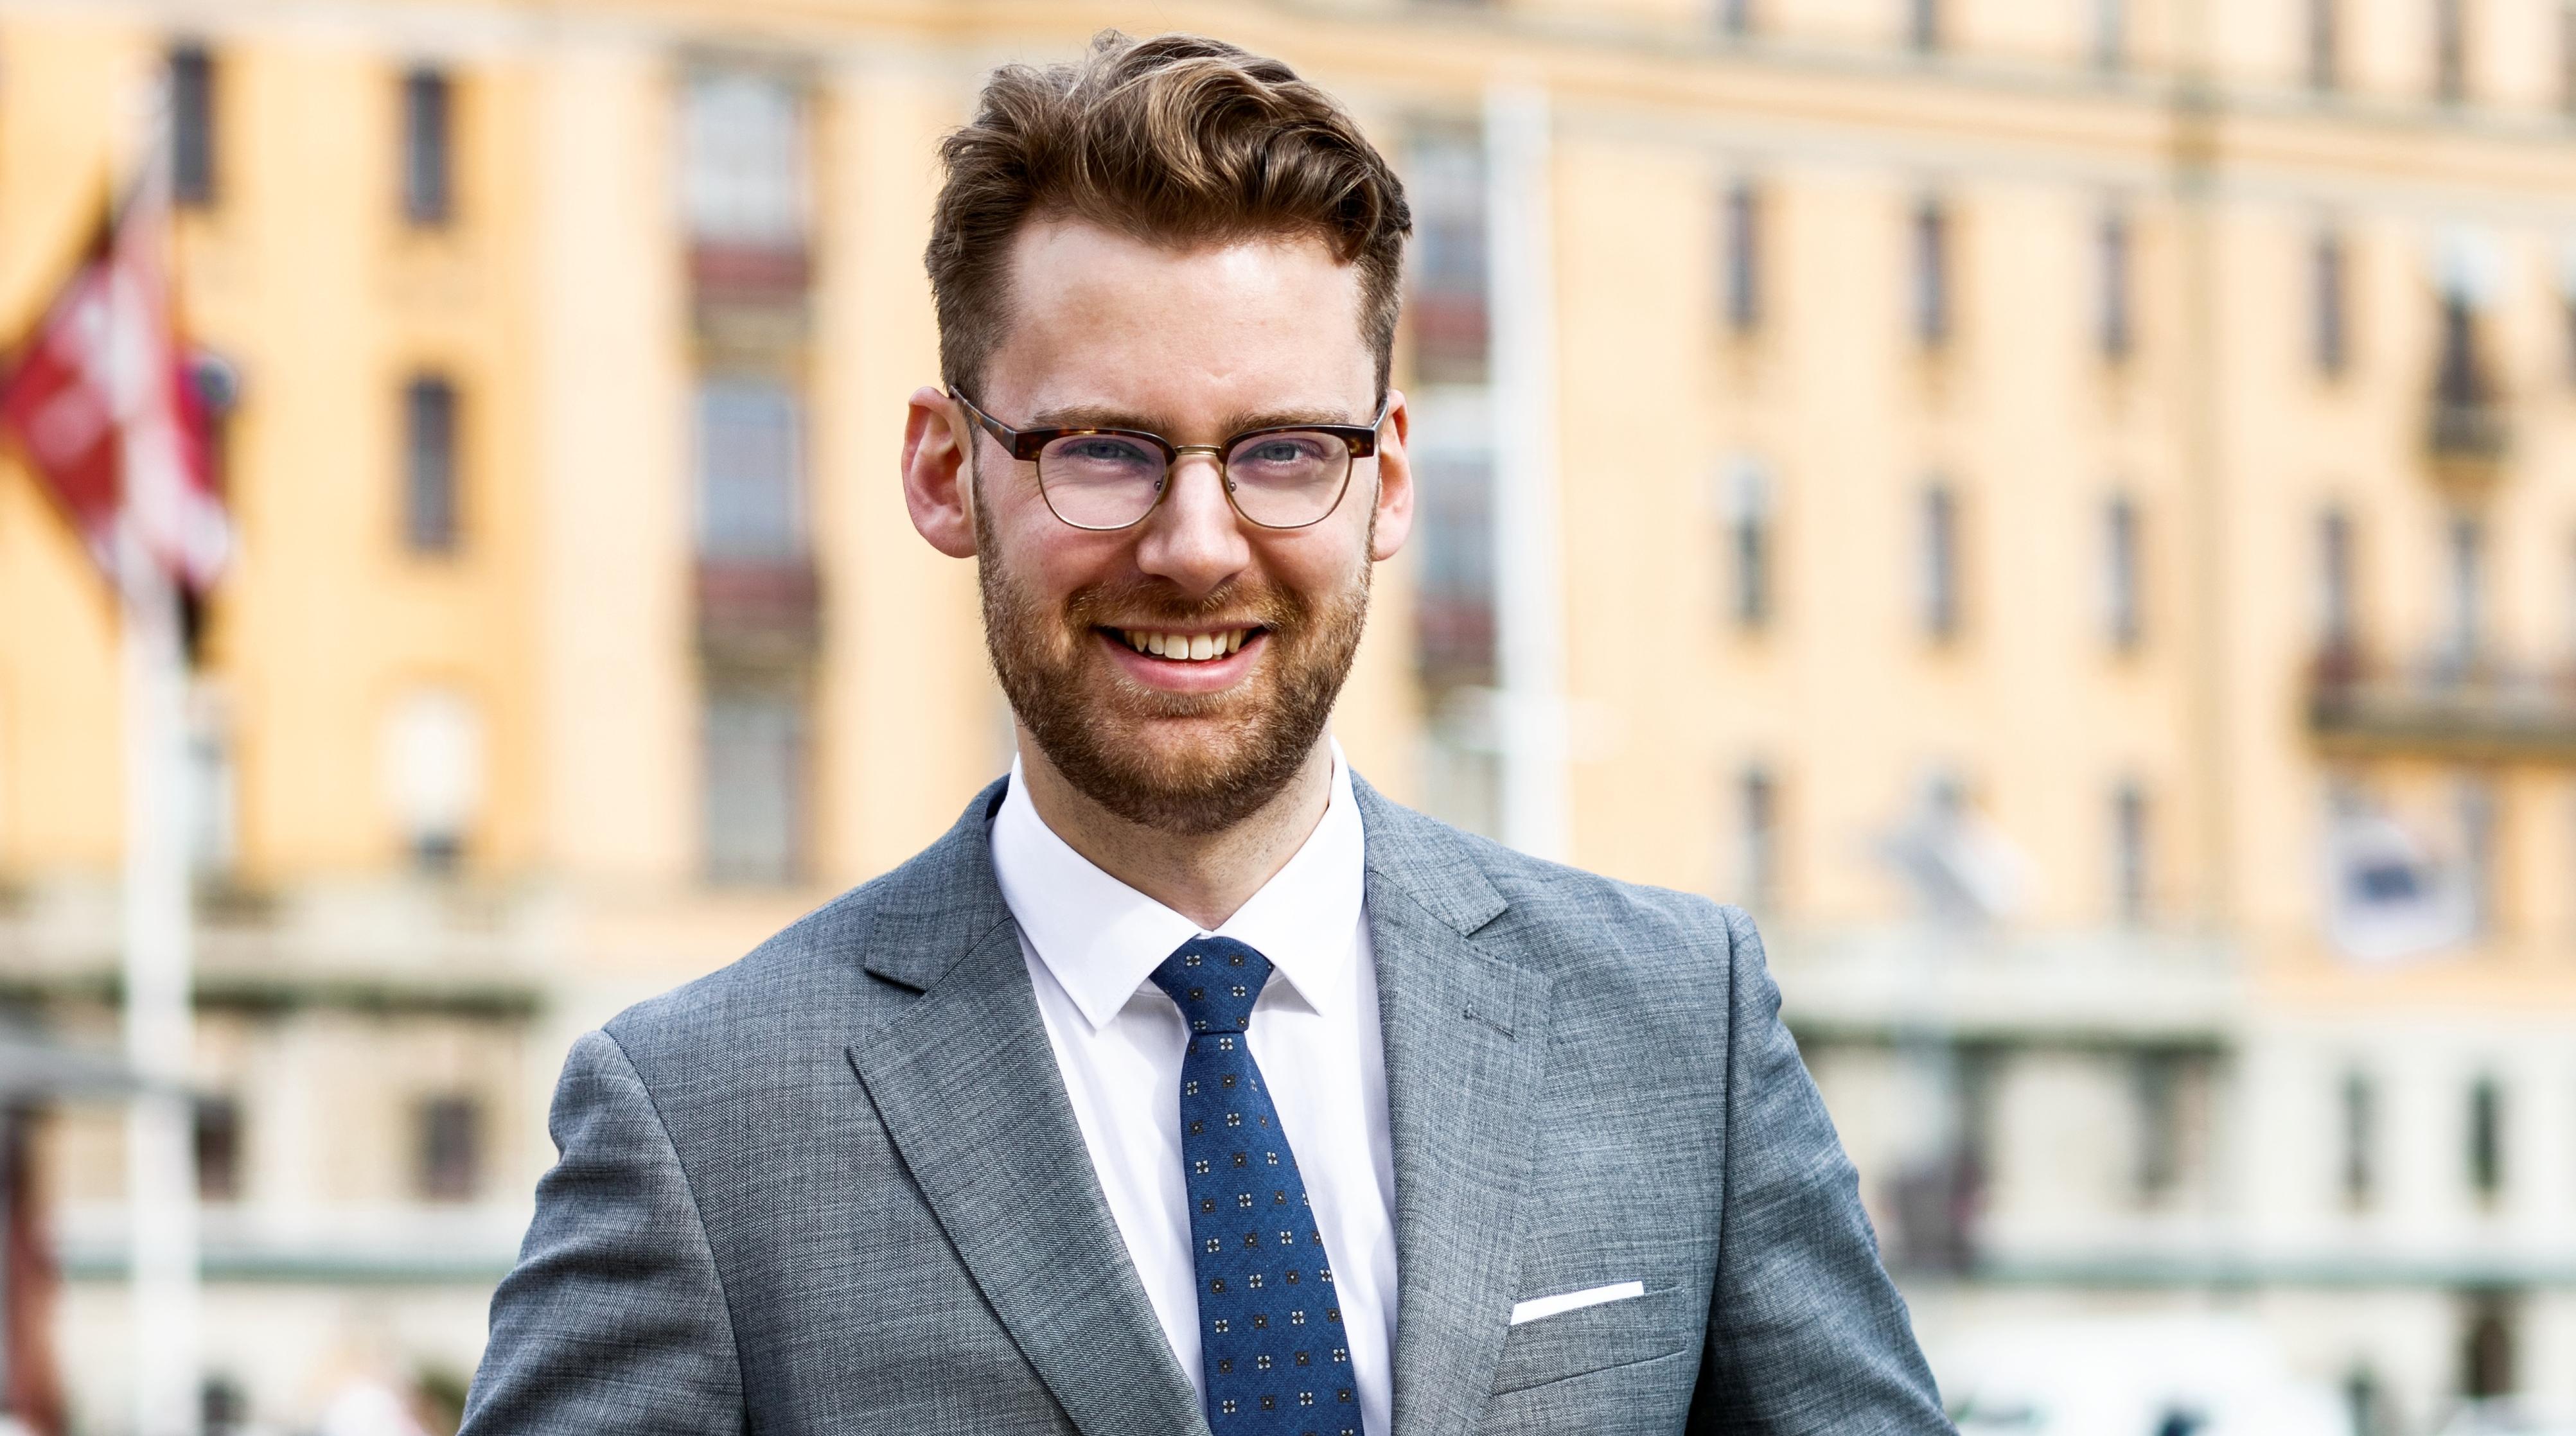 Kille sker kille Sverige Vsterbottens ln - BodyContact